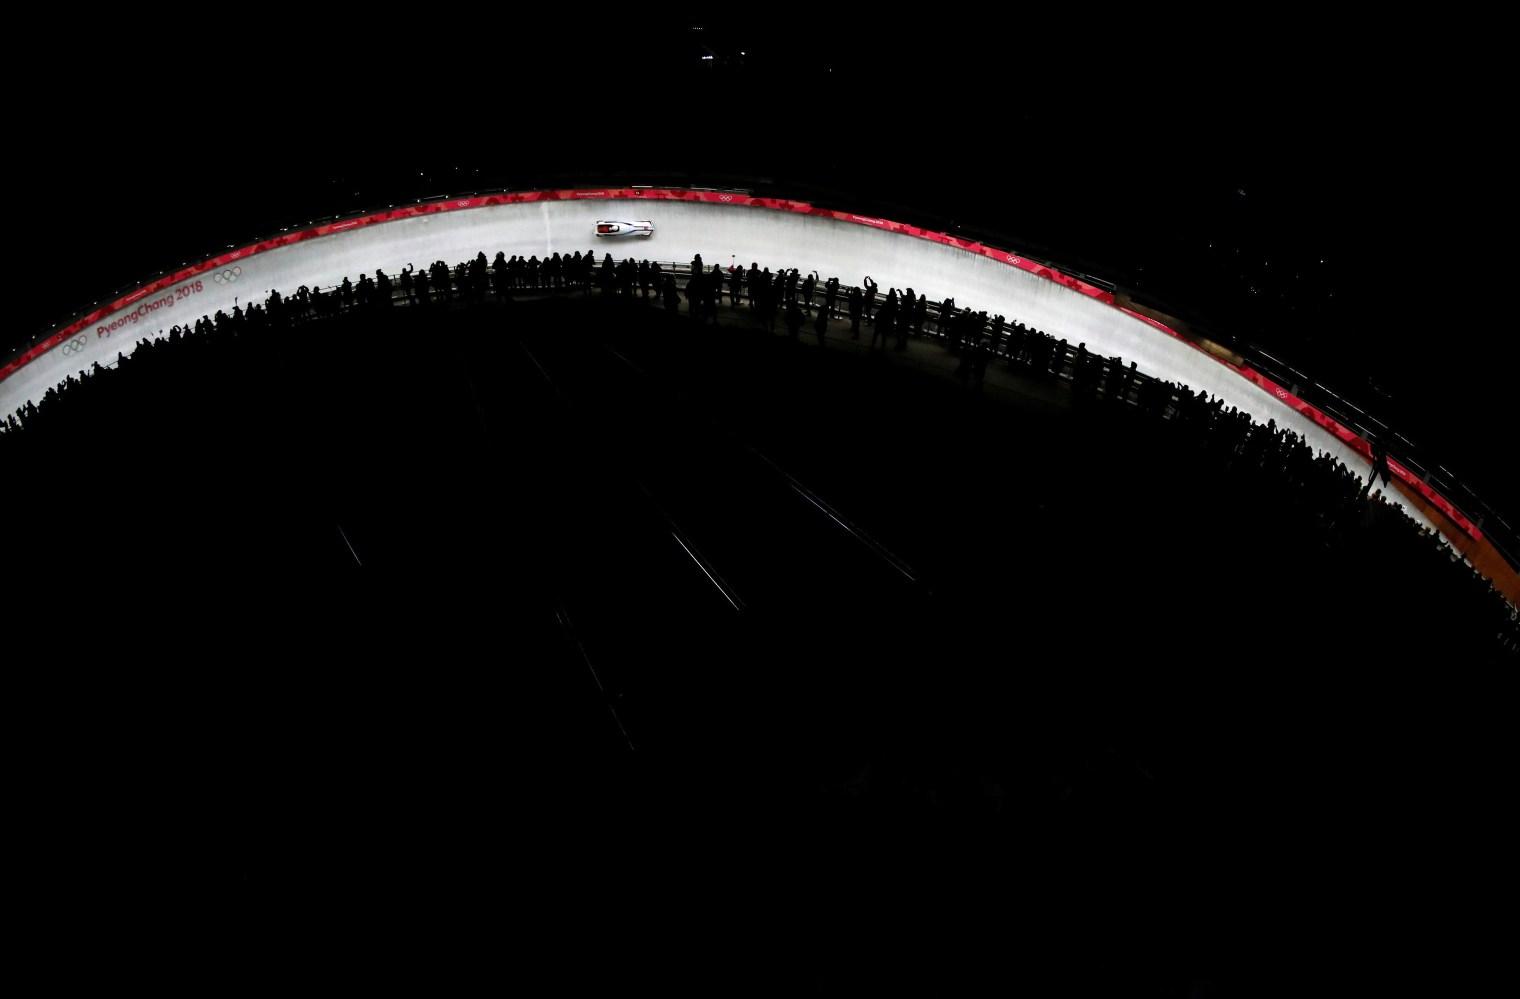 pyeongchang-winter-olympics-2018